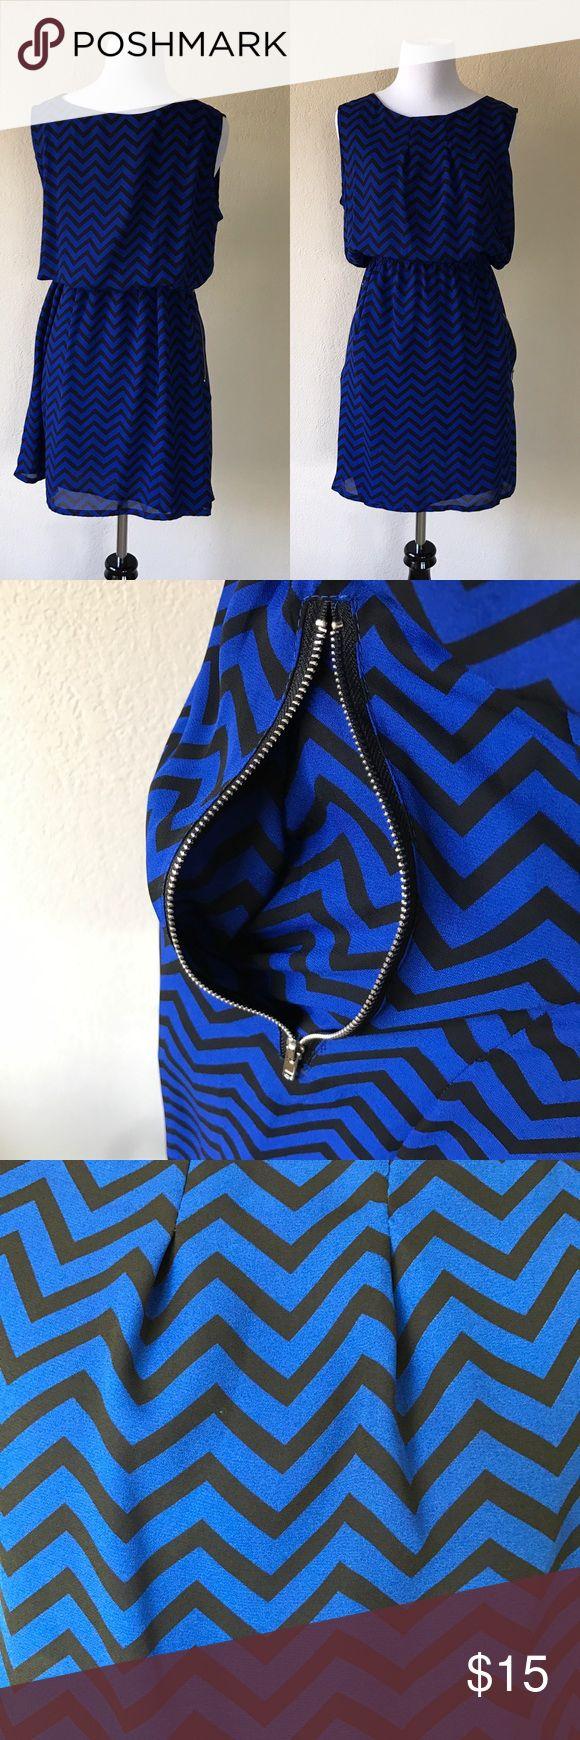 NWOT Sleeveless Blue Chevron Dress Material 100% Polyester / Zipper Pockets on both sizes / elastic waist SML Dresses